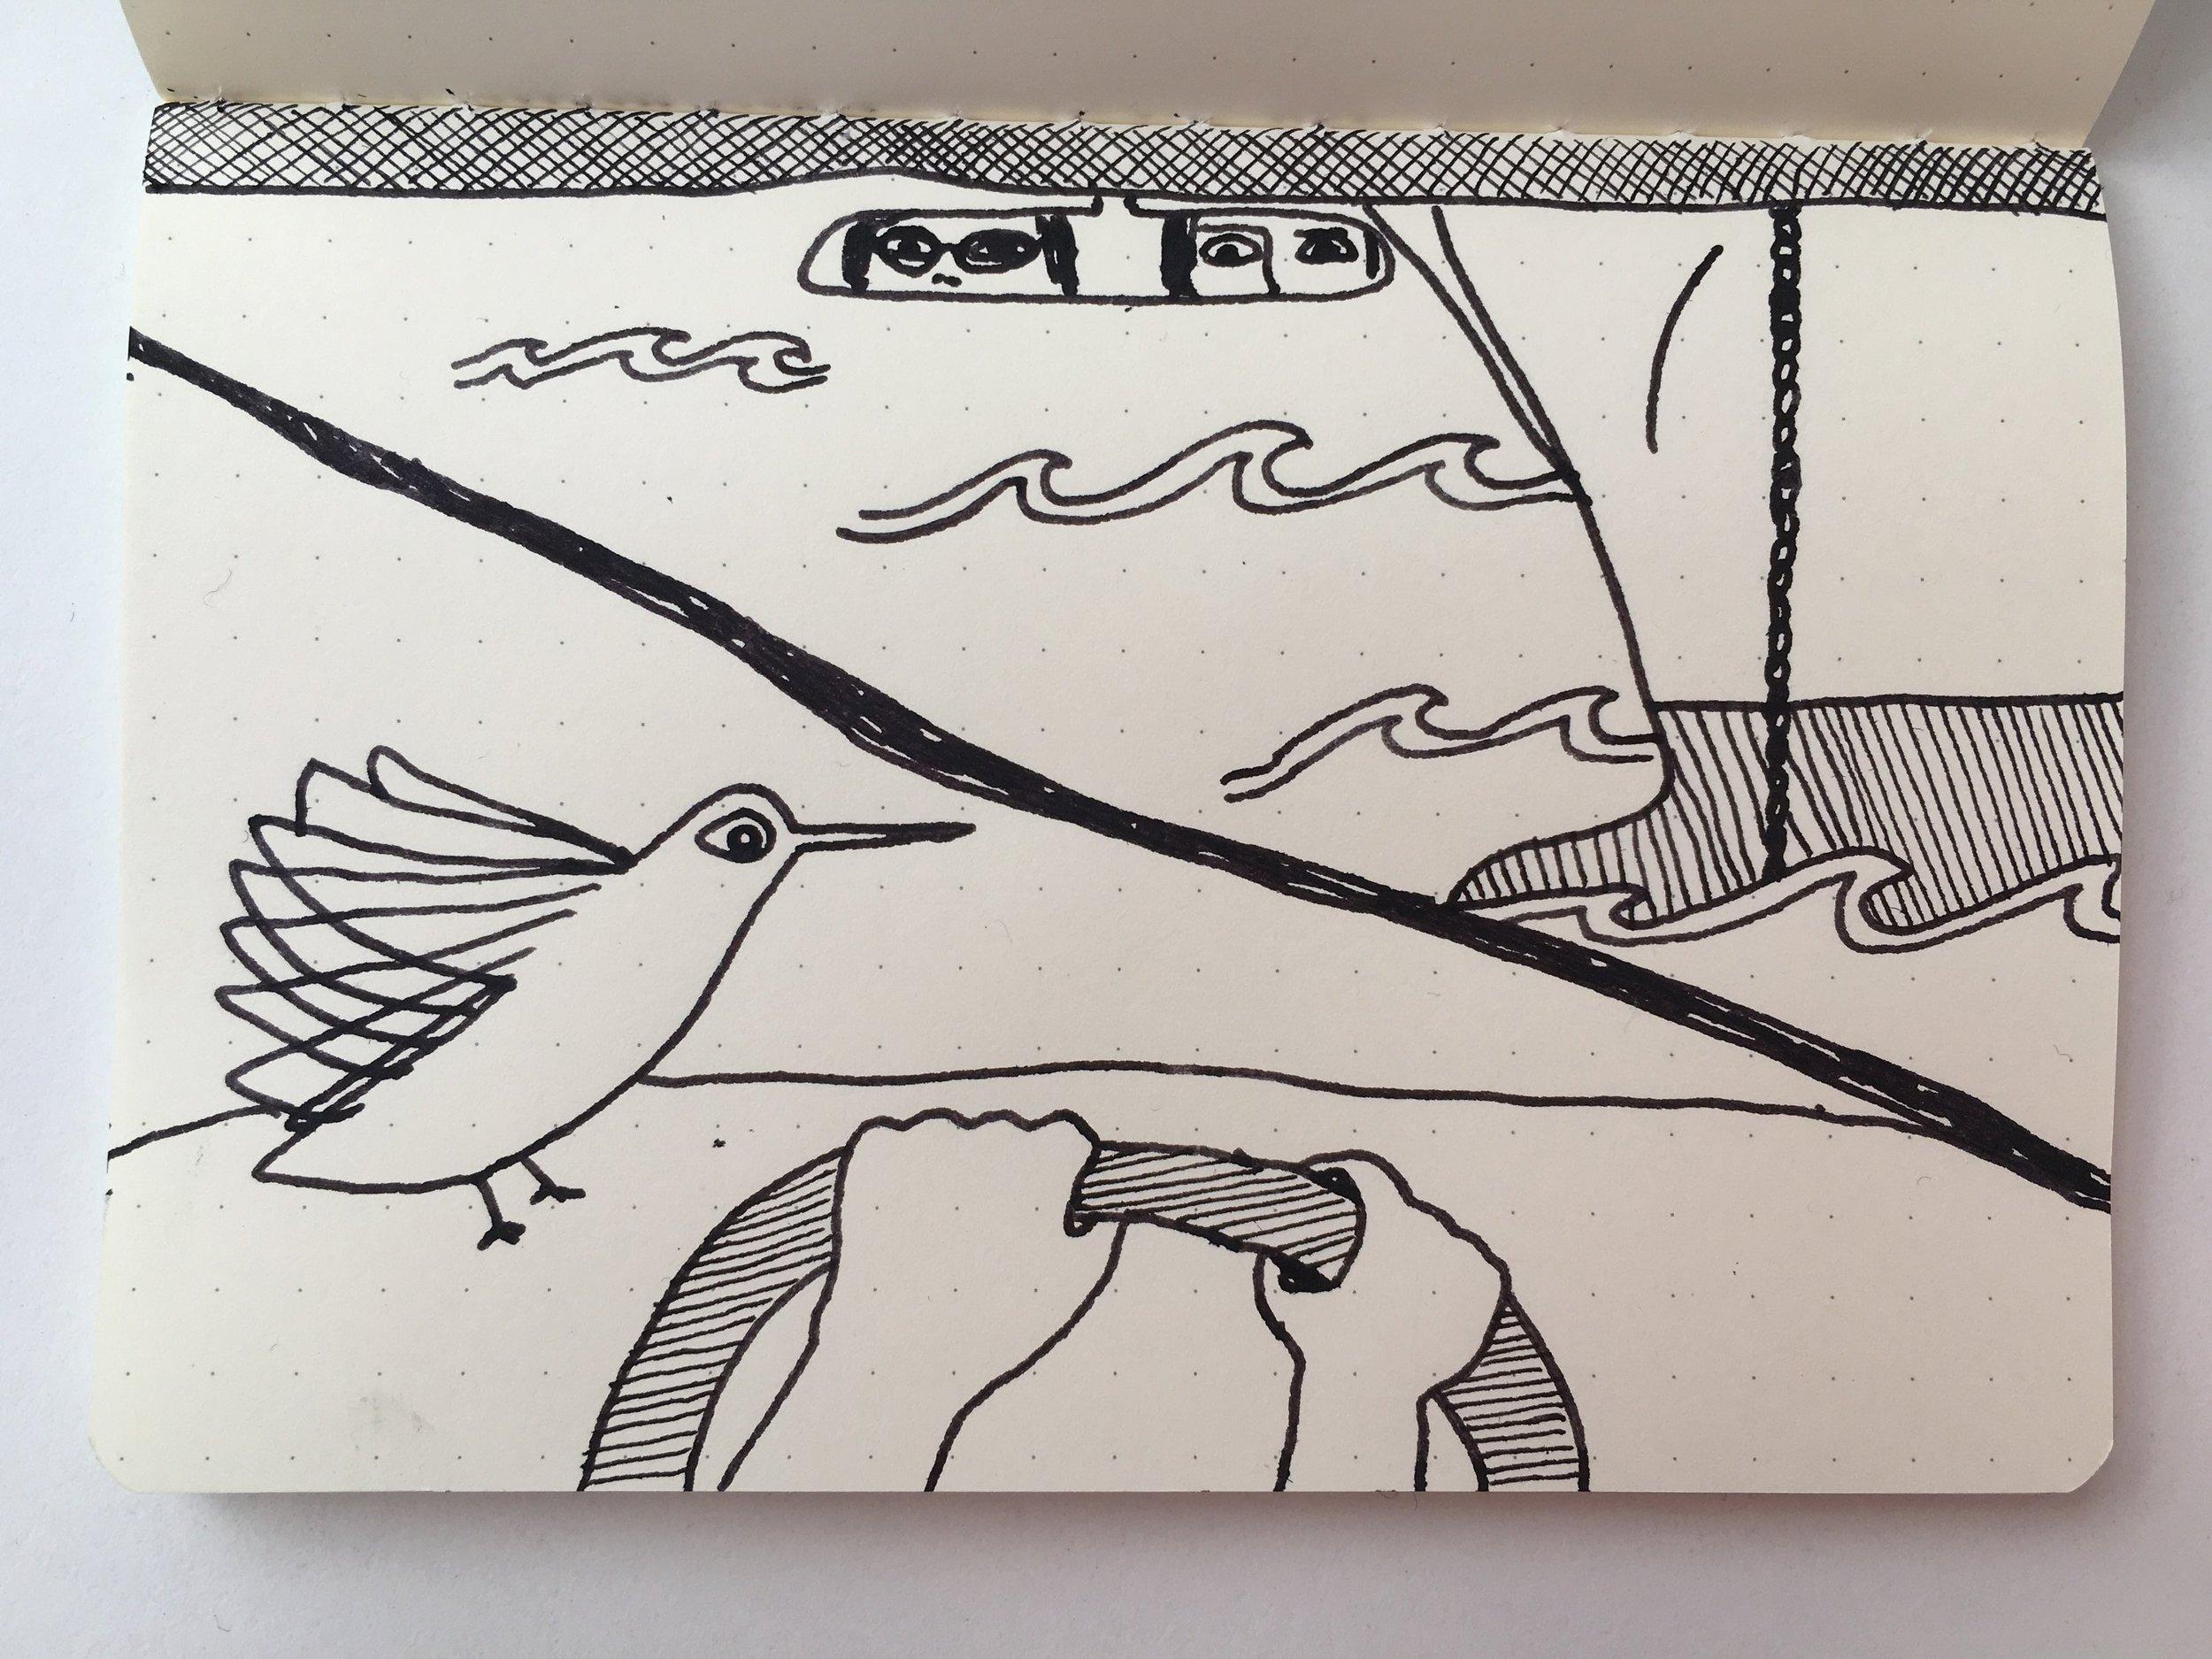 Apologies to the hummingbird. -